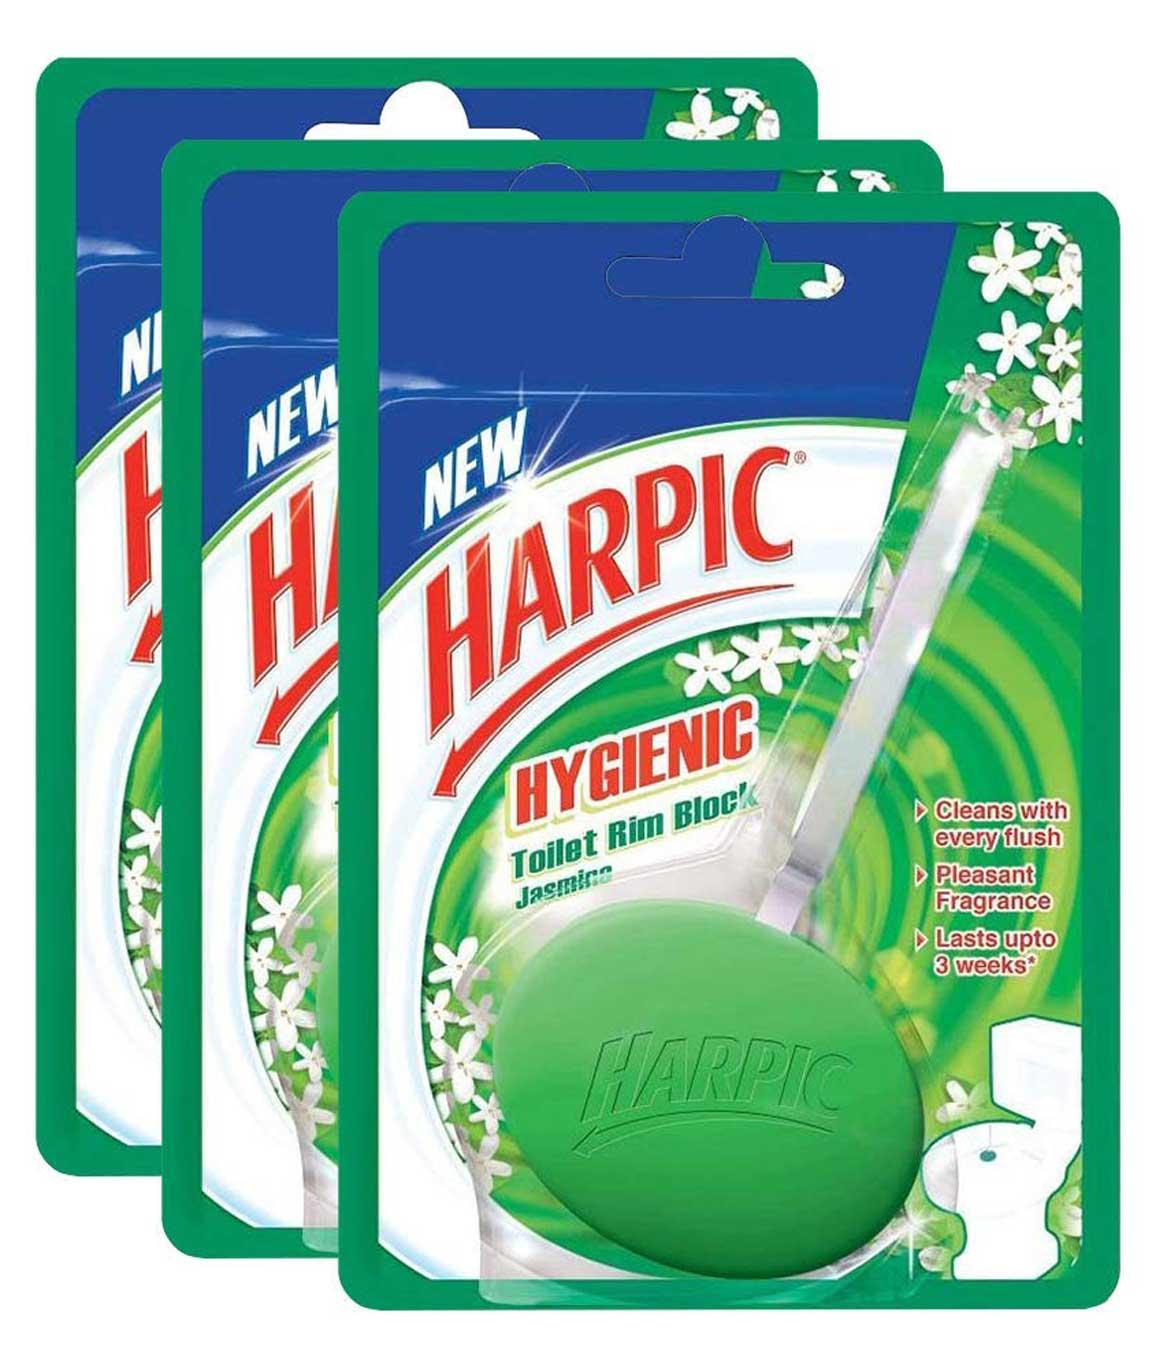 Harpic Hygiene Toilet Rim Block, Jasmine - 26 g (Pack of 3)